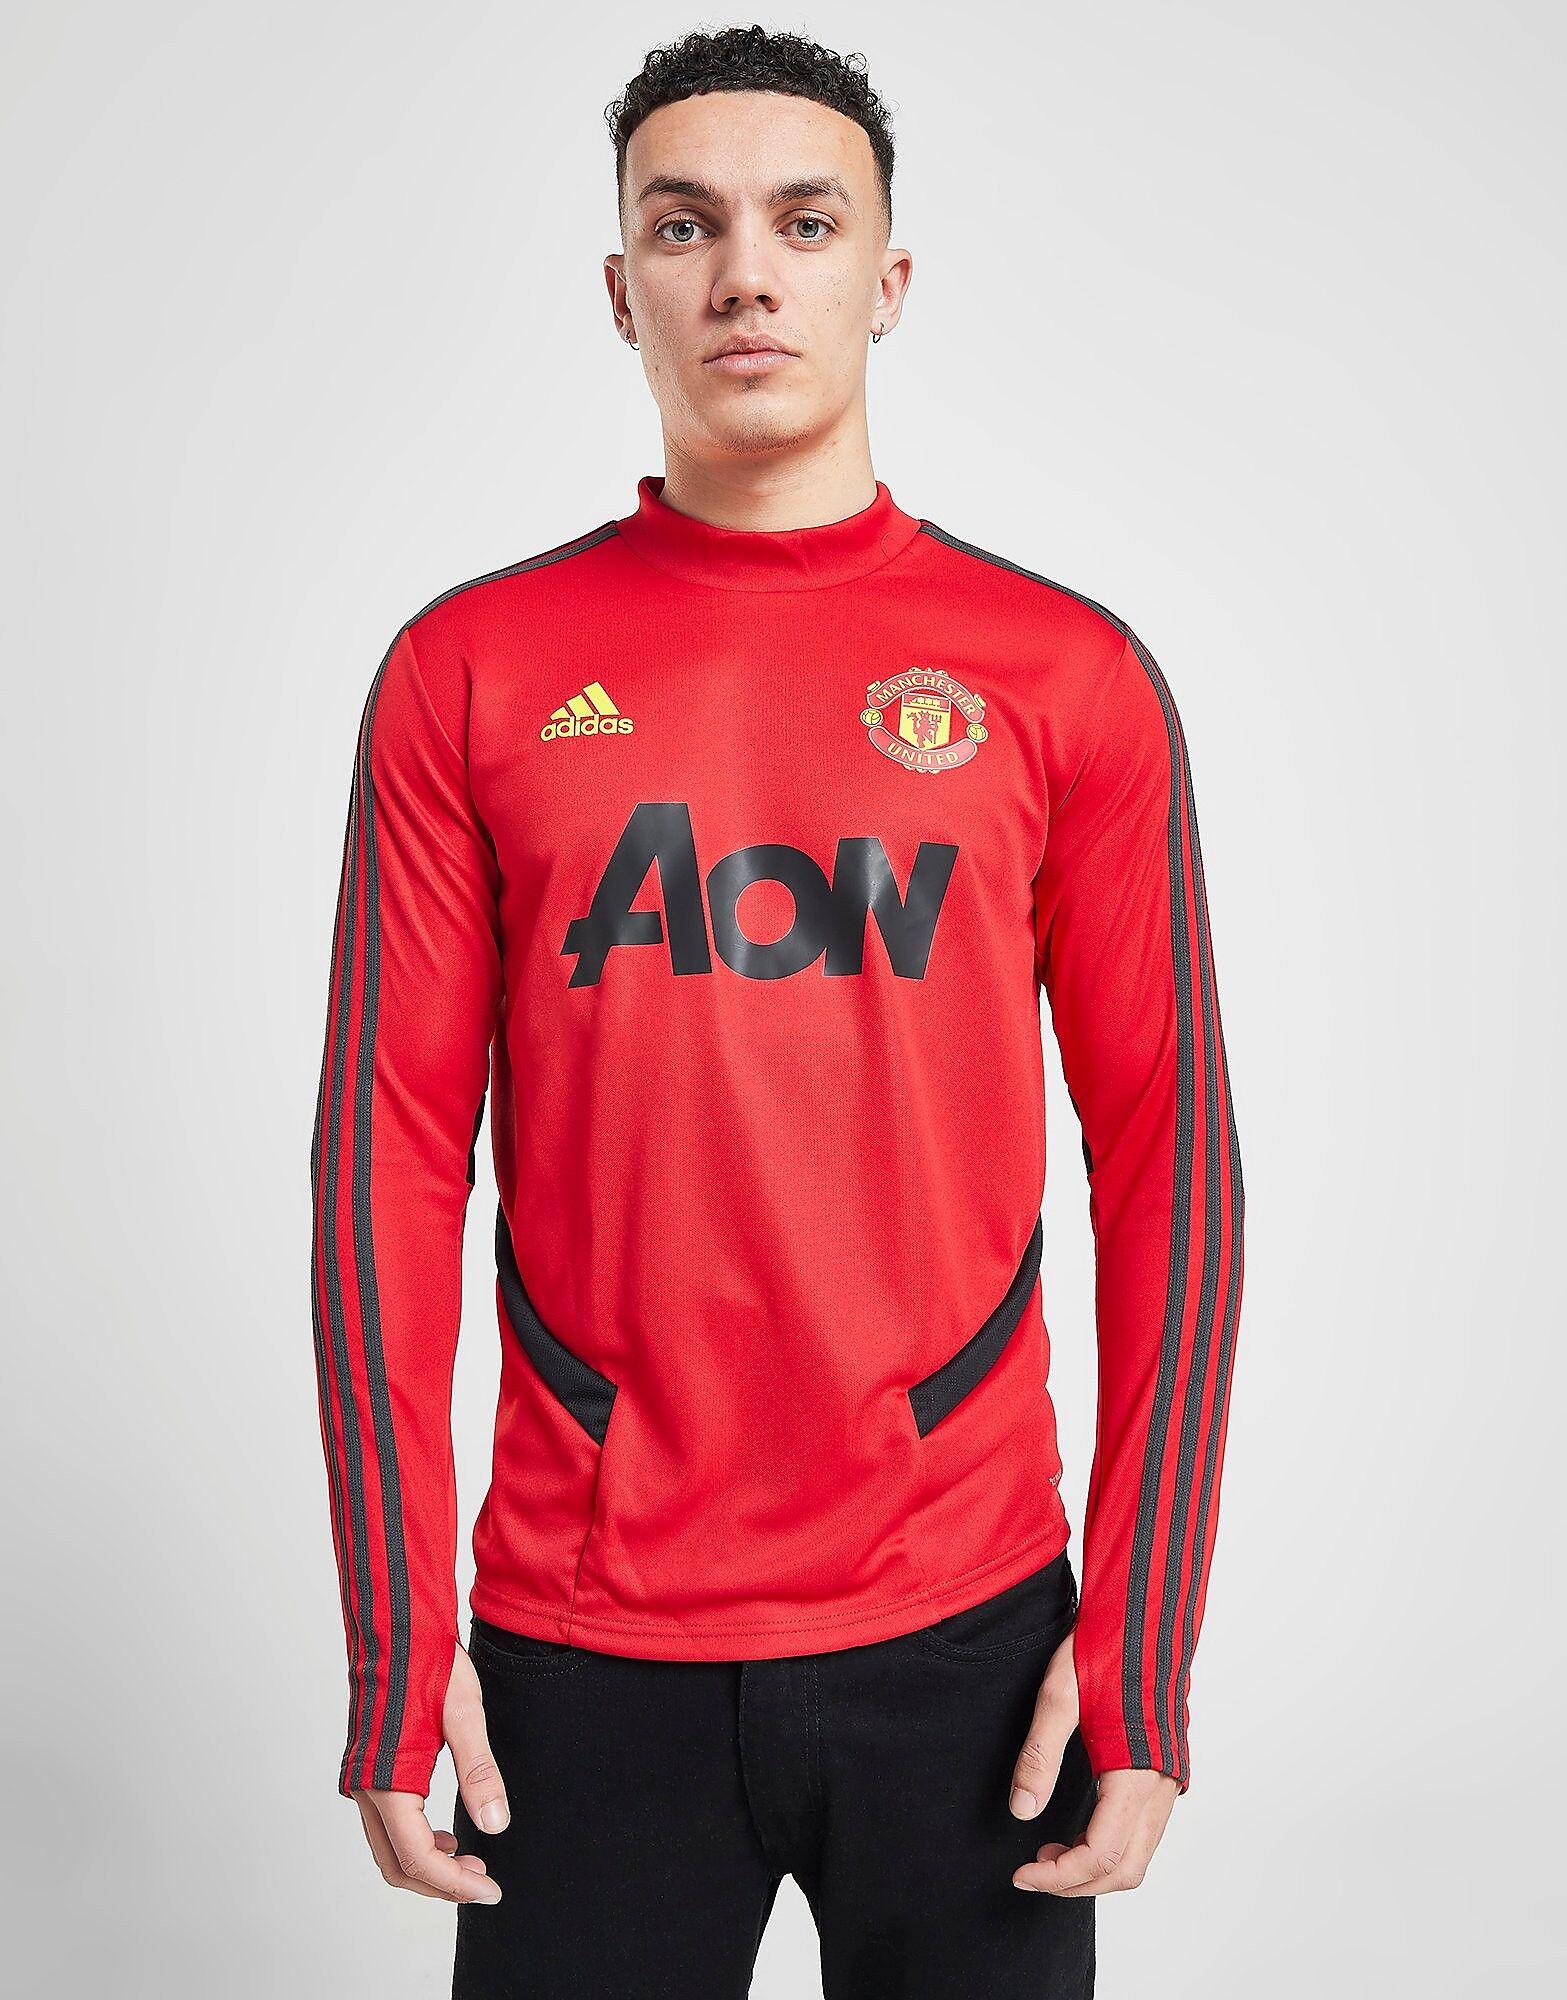 Image of Adidas Manchester United FC Treenipaita Miehet - Mens, Punainen